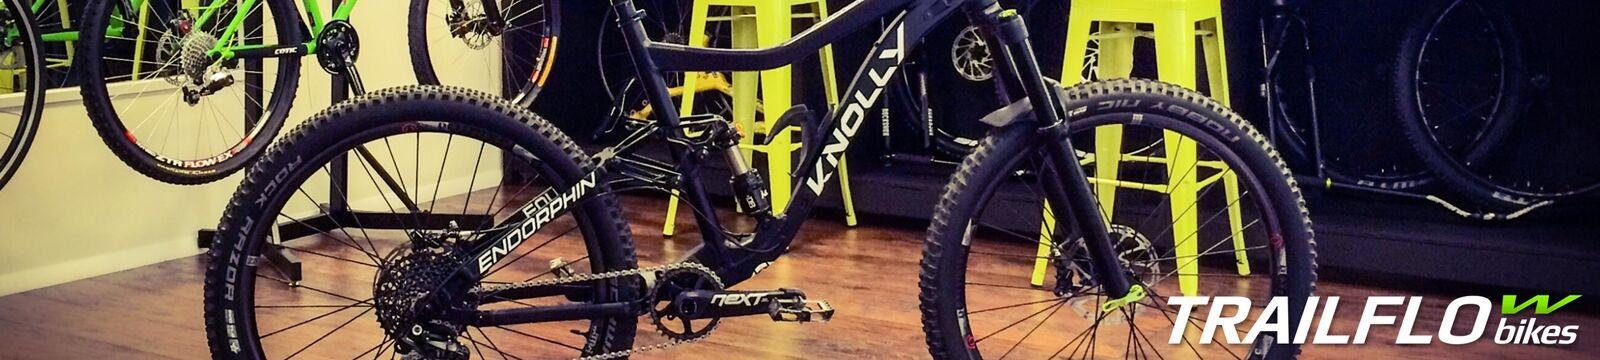 TRAILFLO bikes